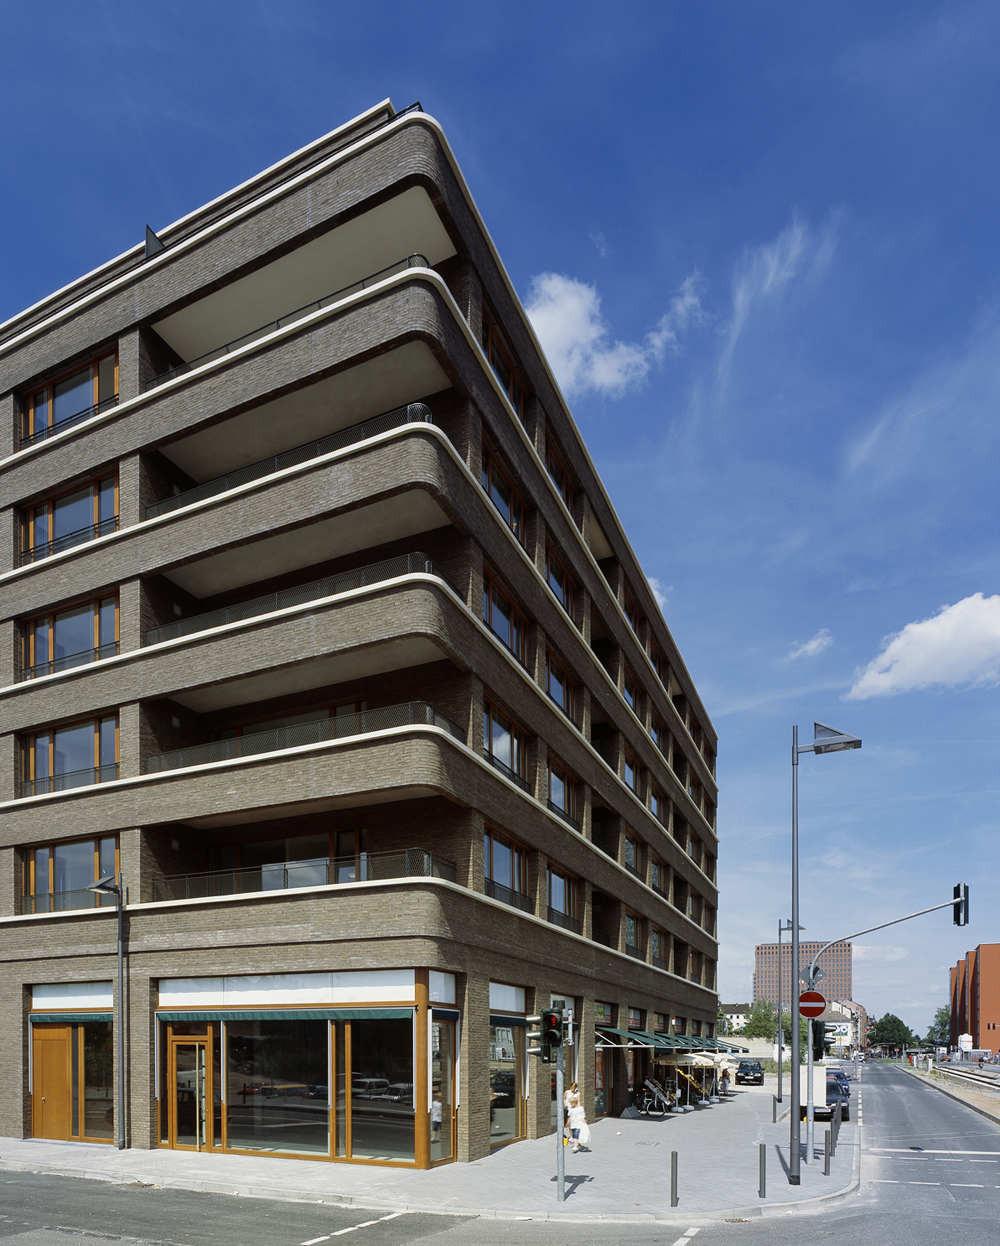 gallery of westgarten stefan forster architekten 7. Black Bedroom Furniture Sets. Home Design Ideas